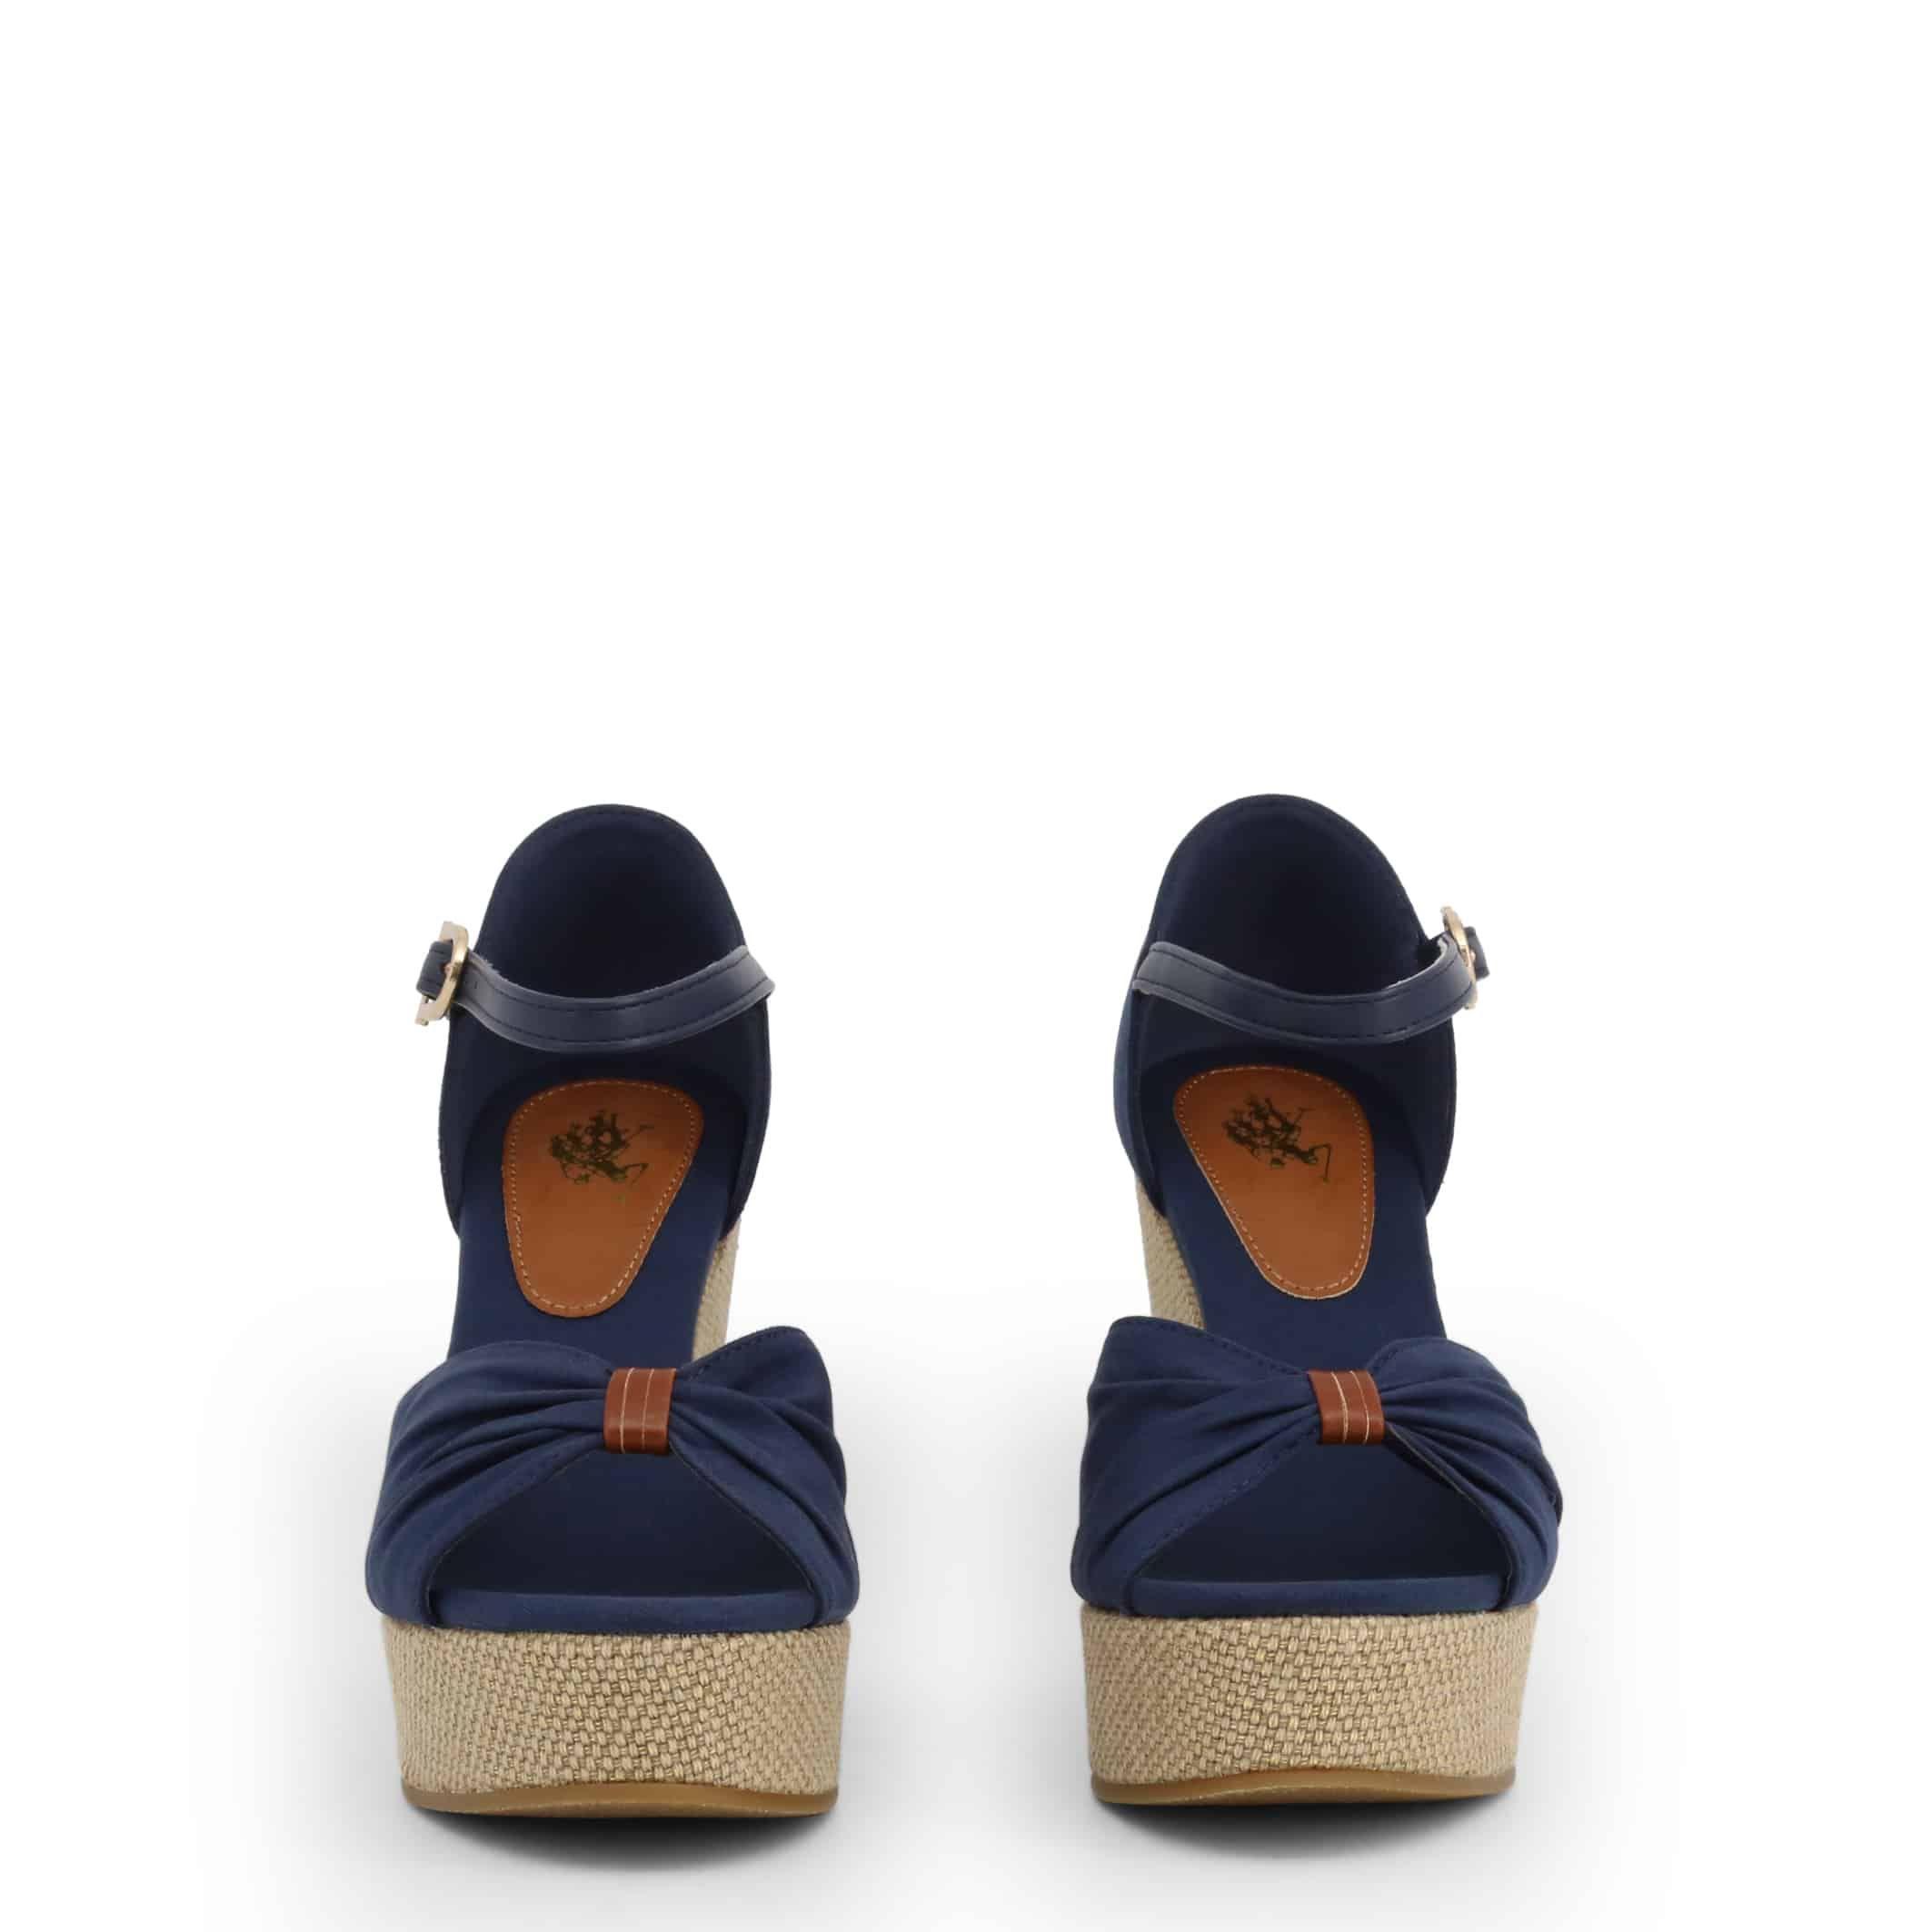 Sandales à plateforme U.S. Polo Assn. – AYLIN4171S0_CY1